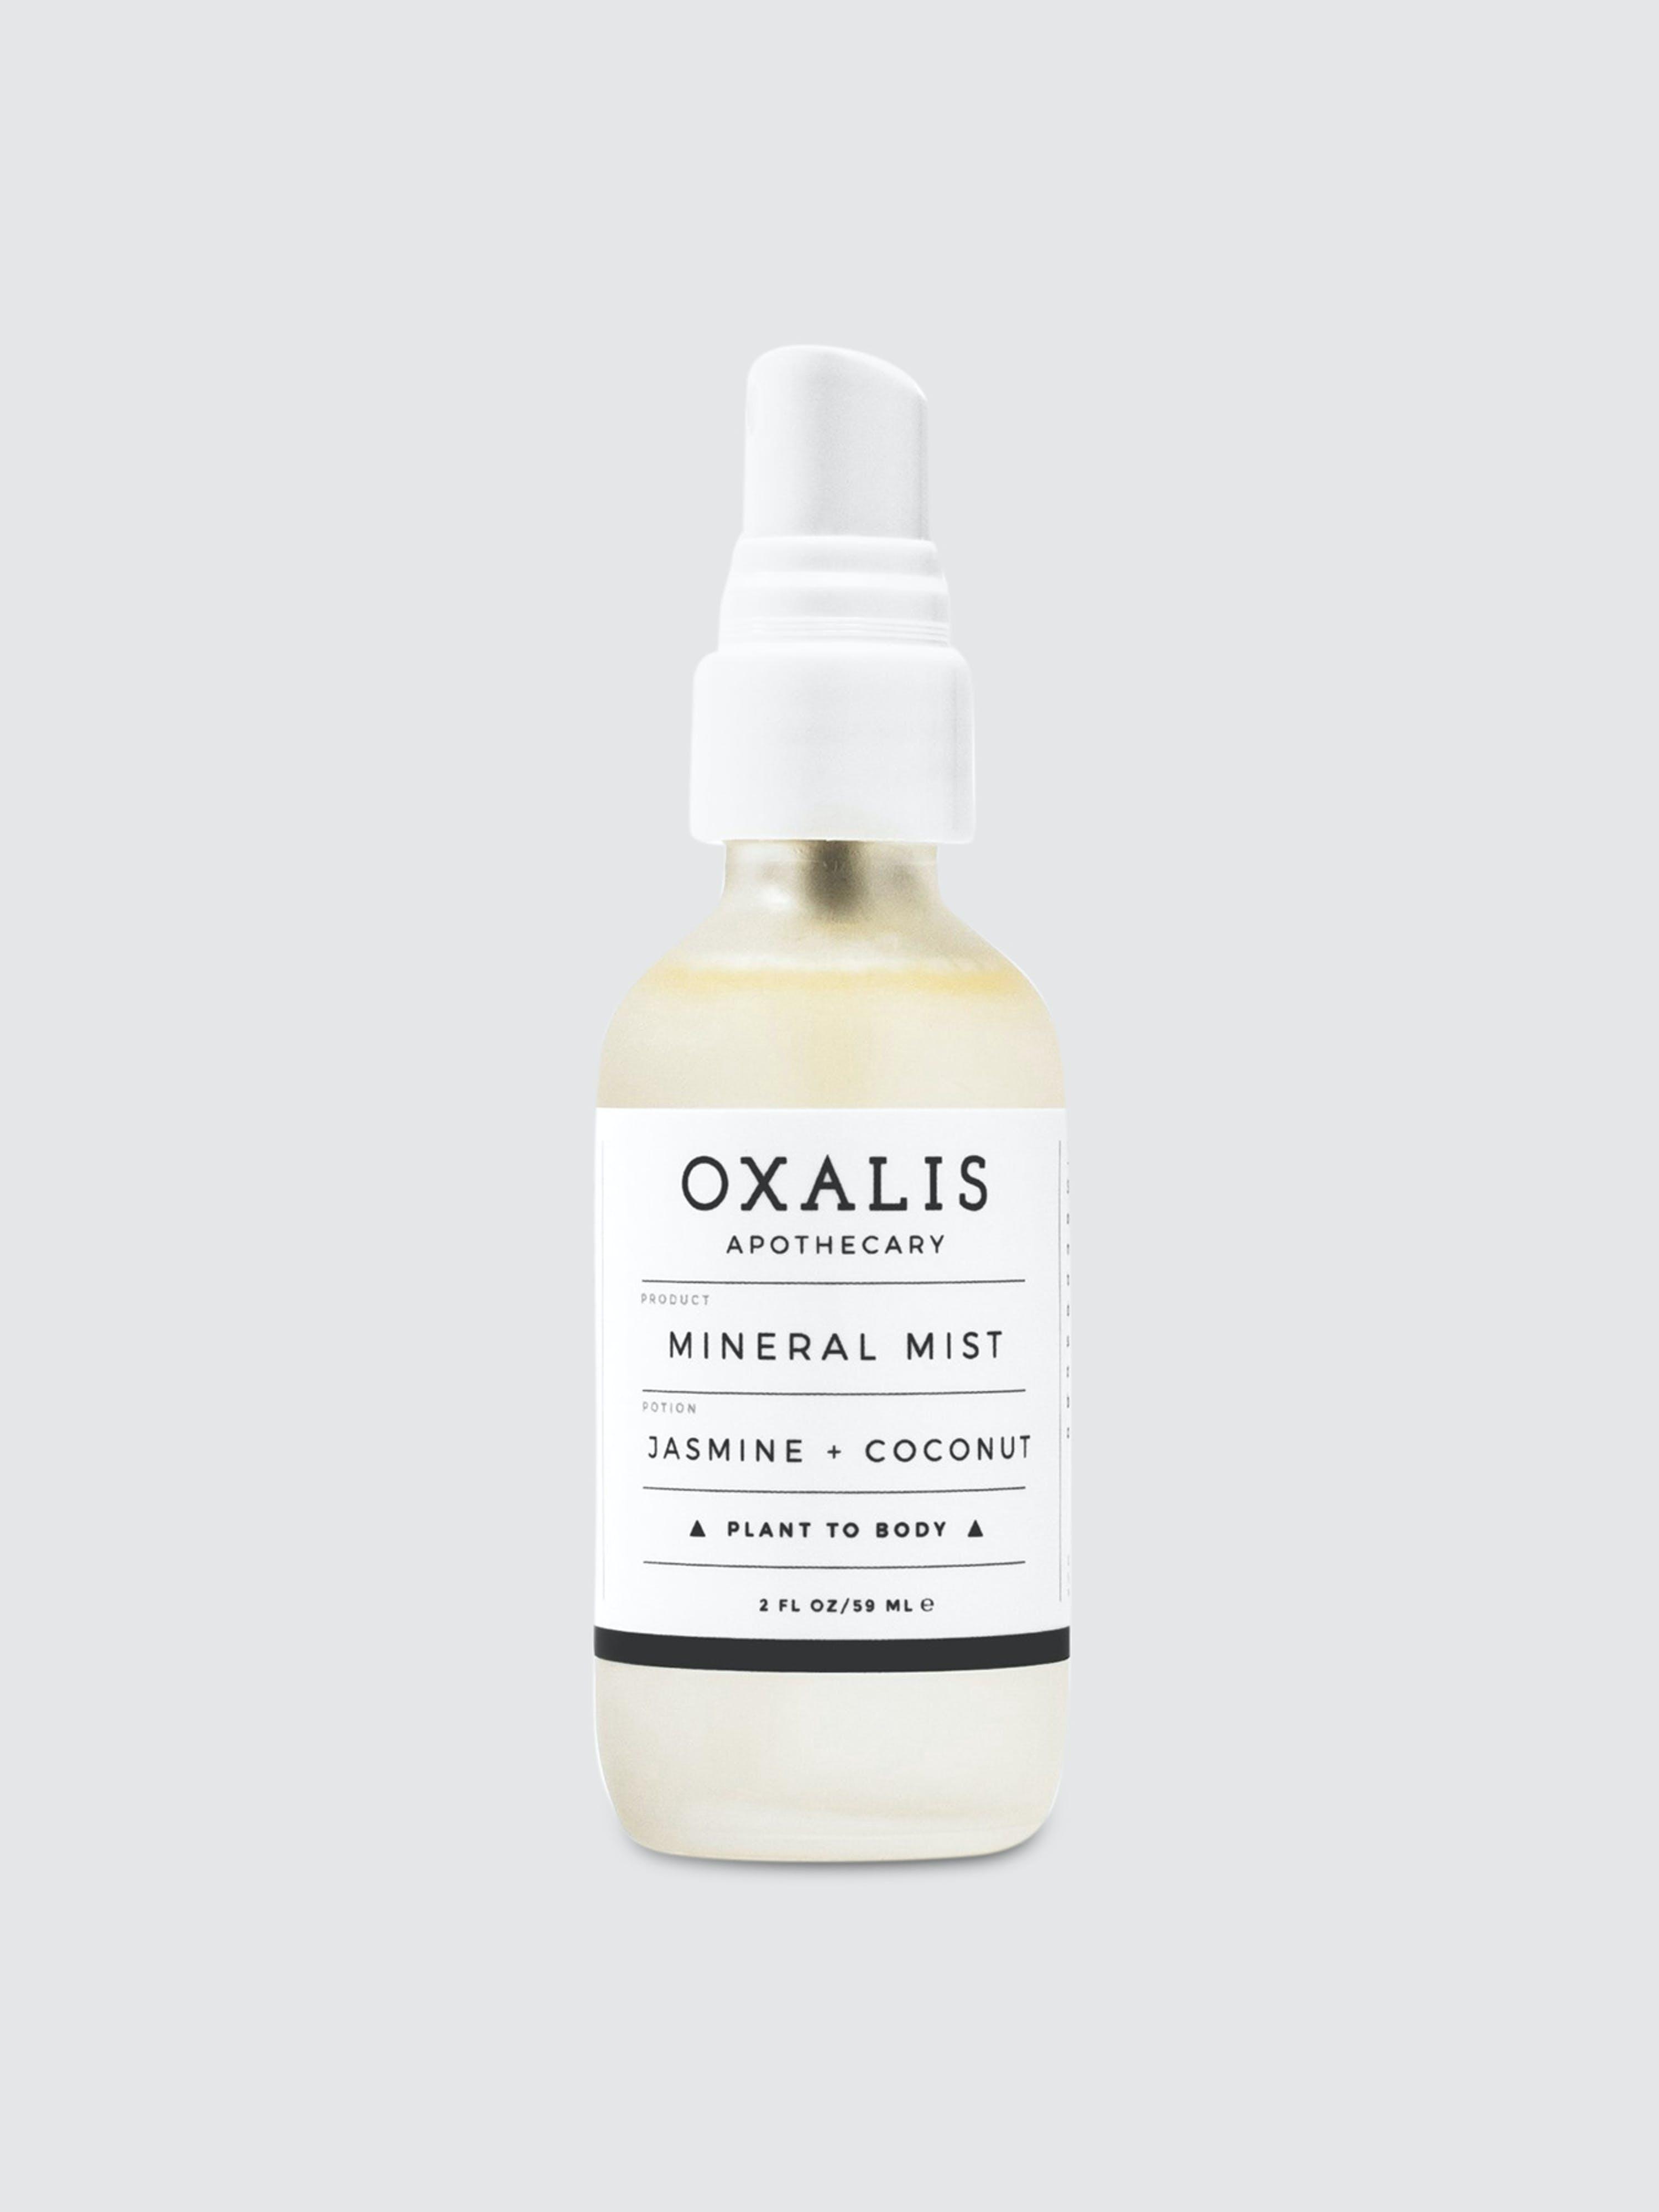 Oxalis Apothecary Mineral Mist | Jasmine + Coconut